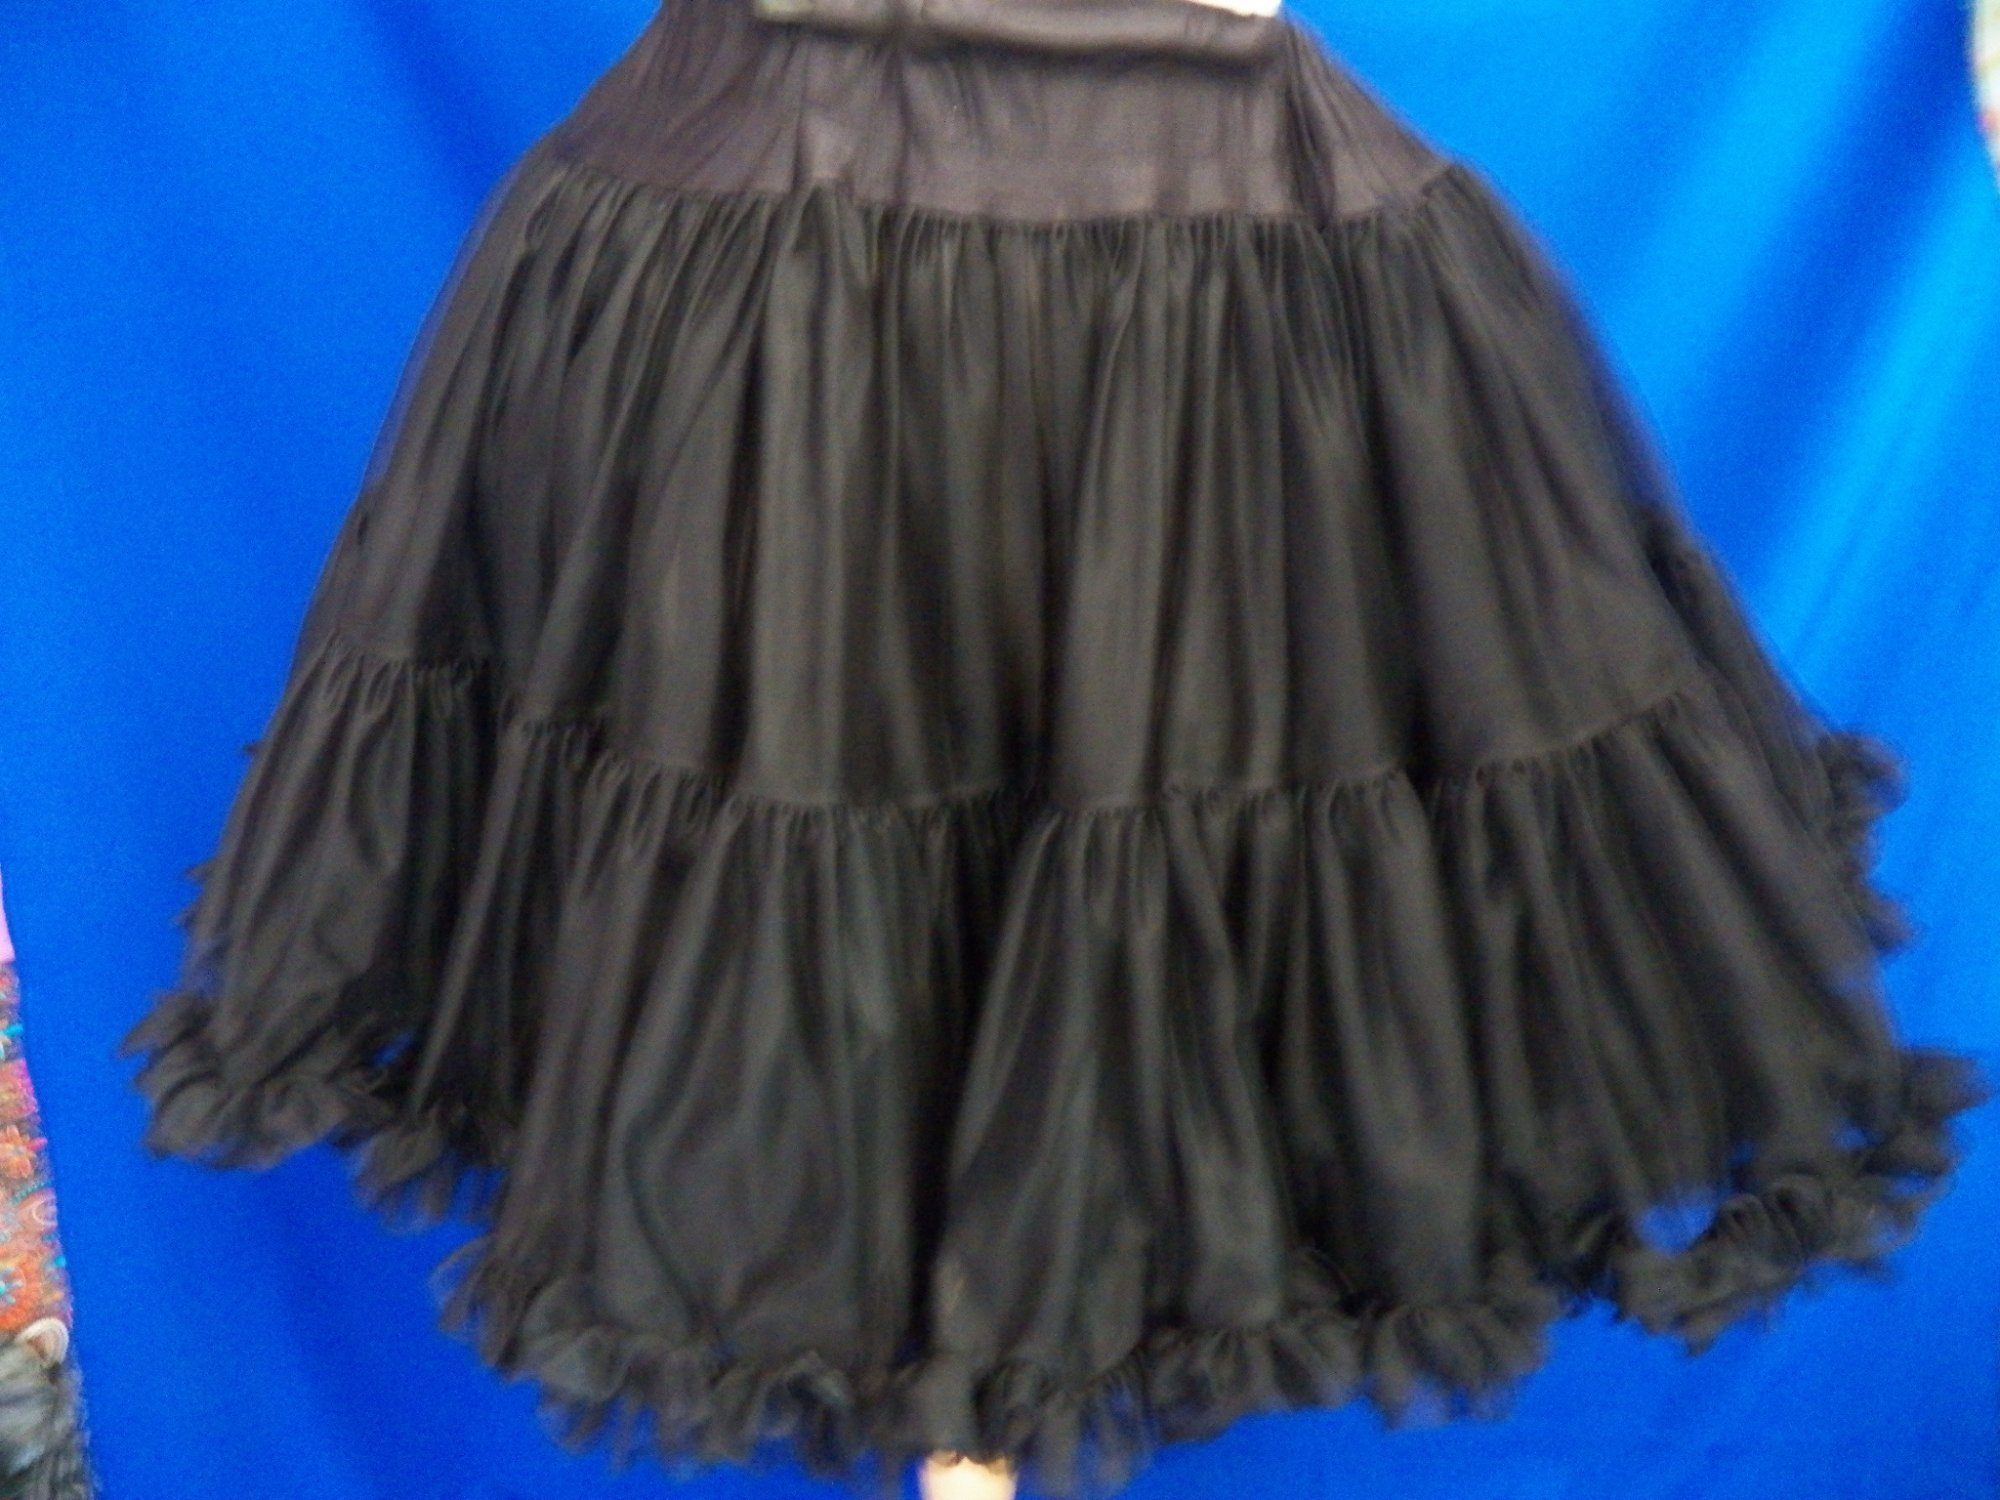 Nylon Chiffon Petticoat